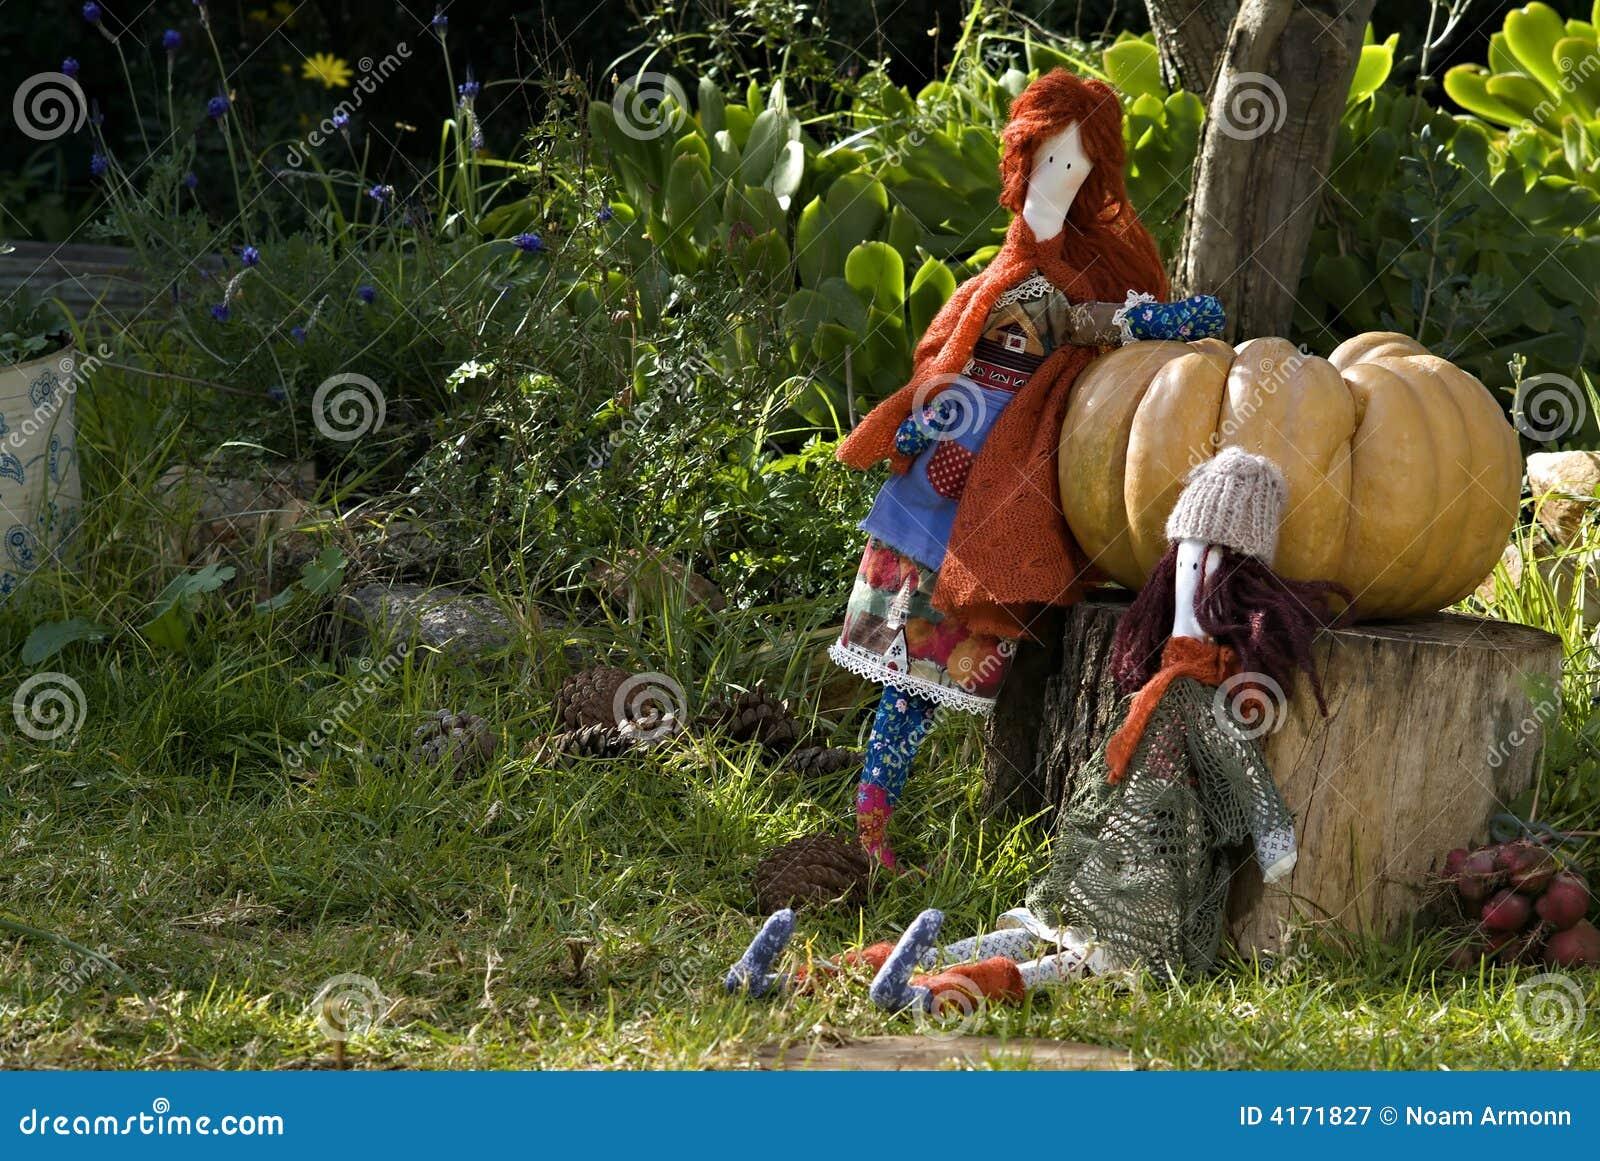 Ragdolls with pumpkin